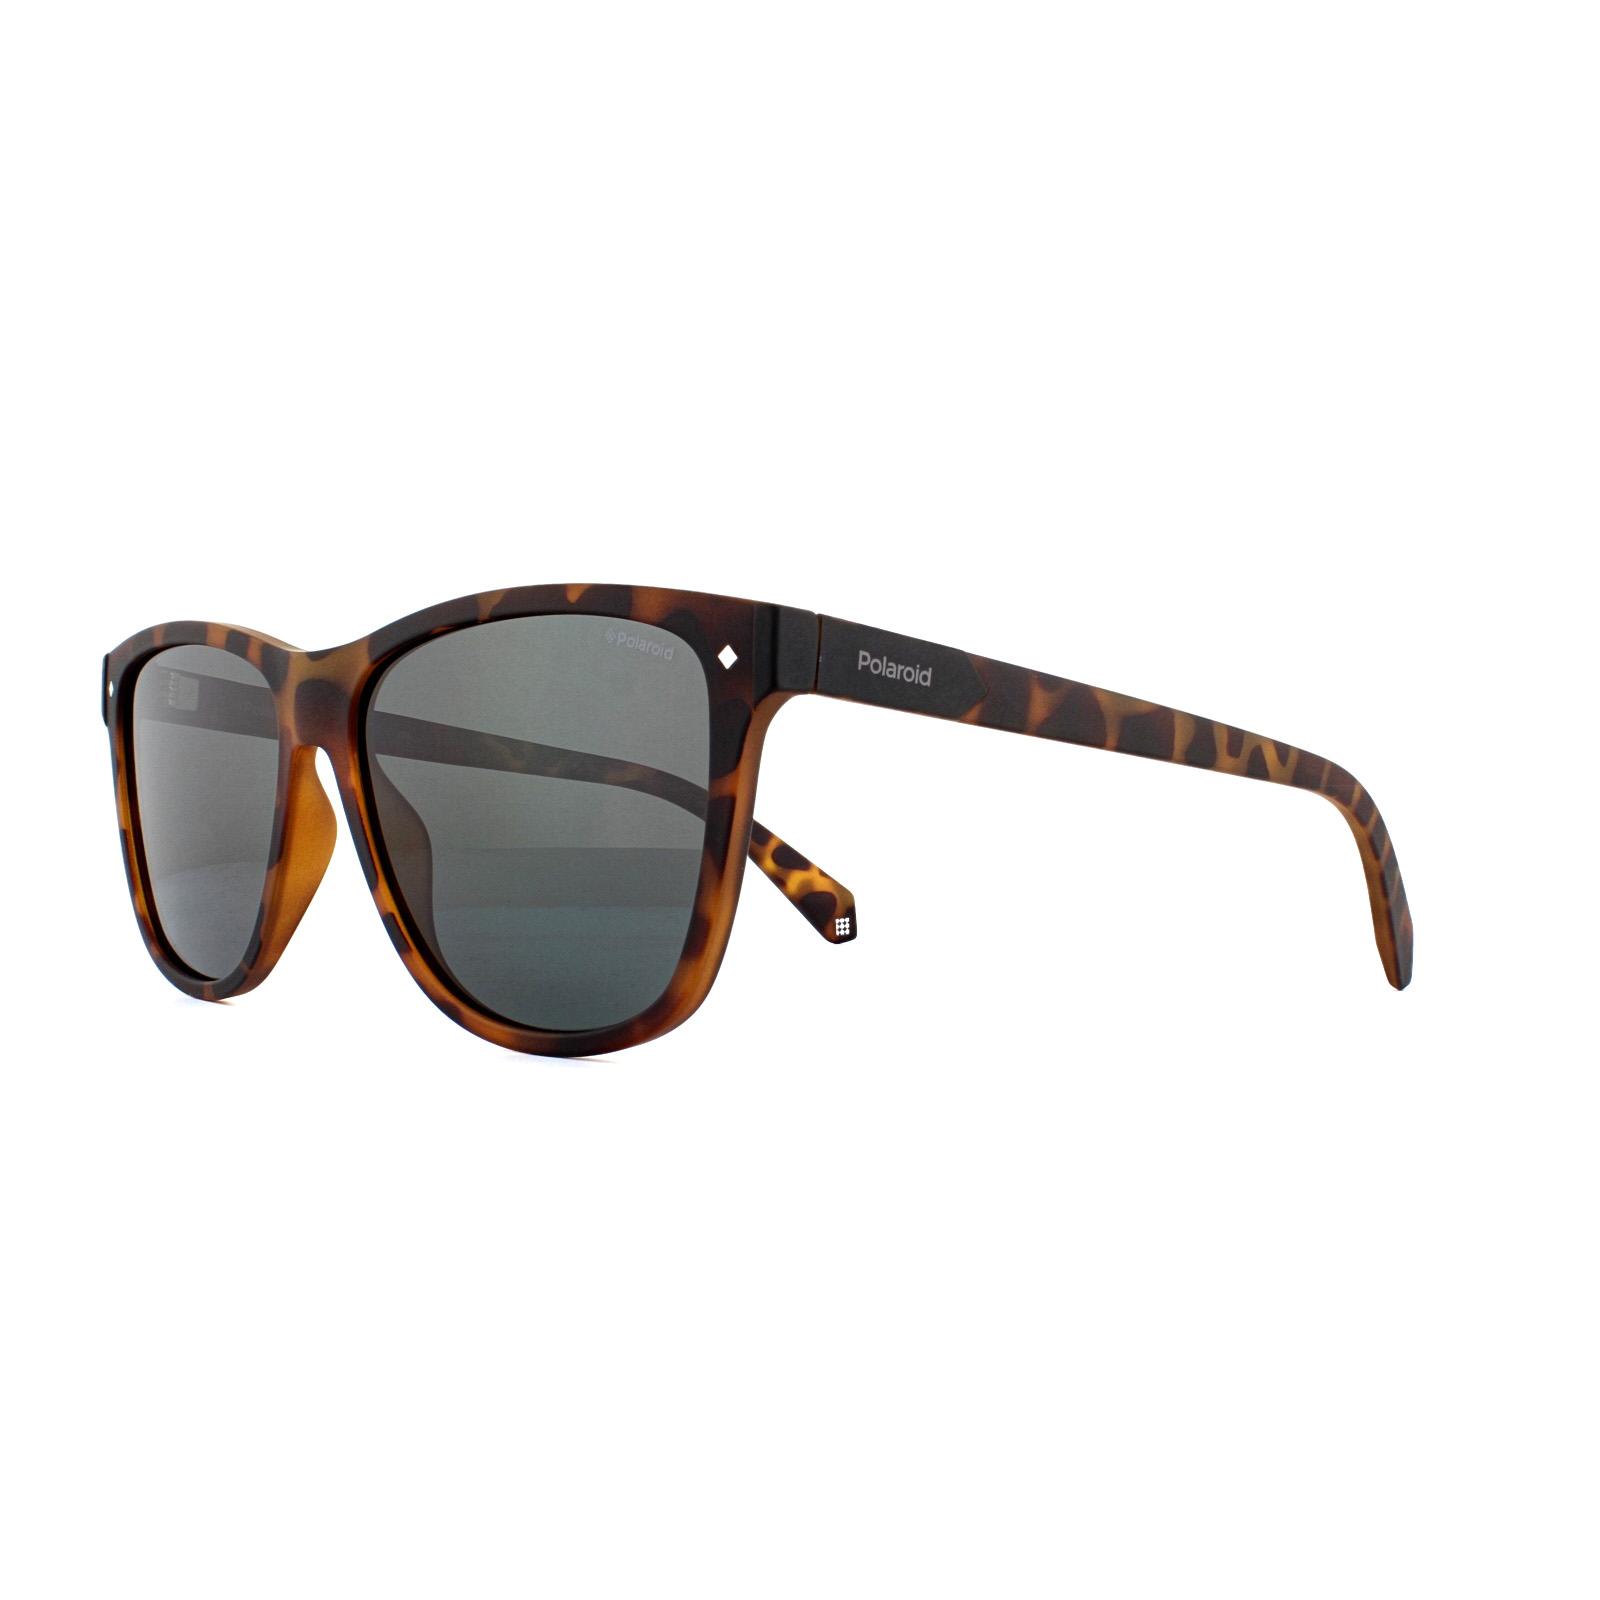 c11caa37b91 Sentinel Polaroid Sunglasses PLD 6035 S N9P M9 Matte Havana Grey Polarized